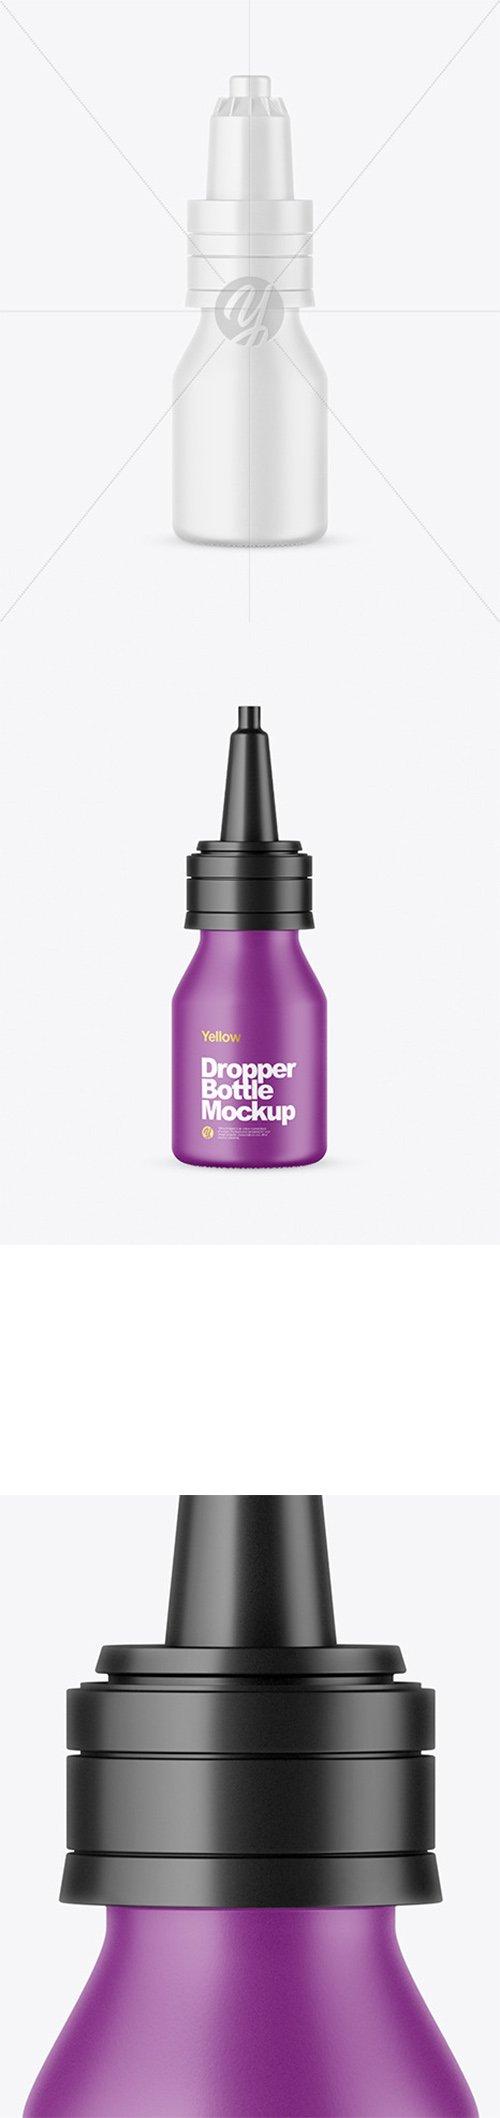 Matte Dropper Bottle Mockup 65609